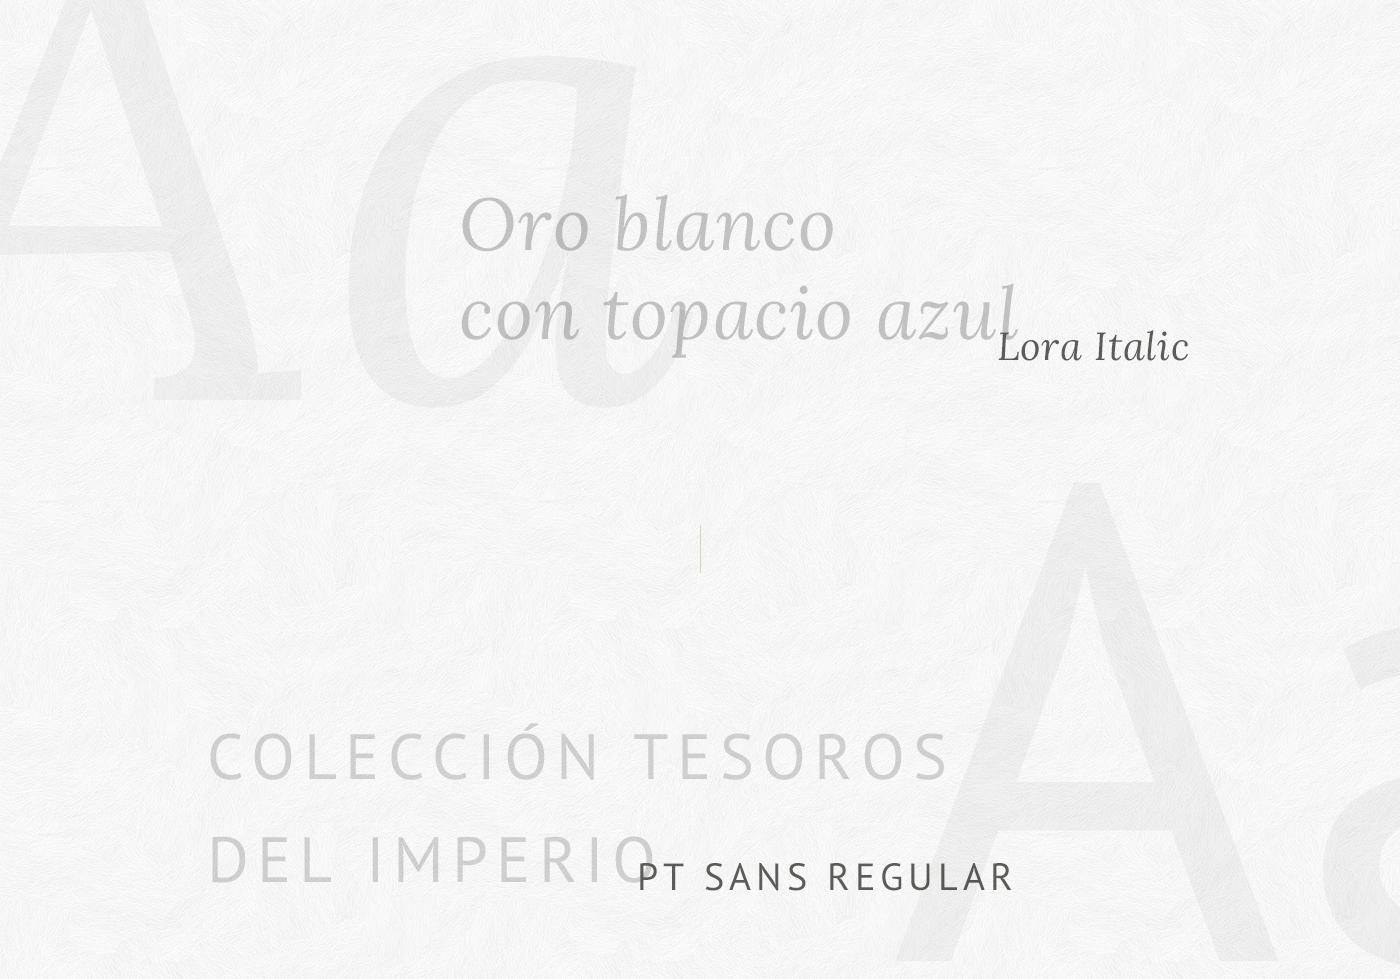 Responsive Web jewelry smartphone rwd ux Experience design luxury corporate agency artisan studio redbility